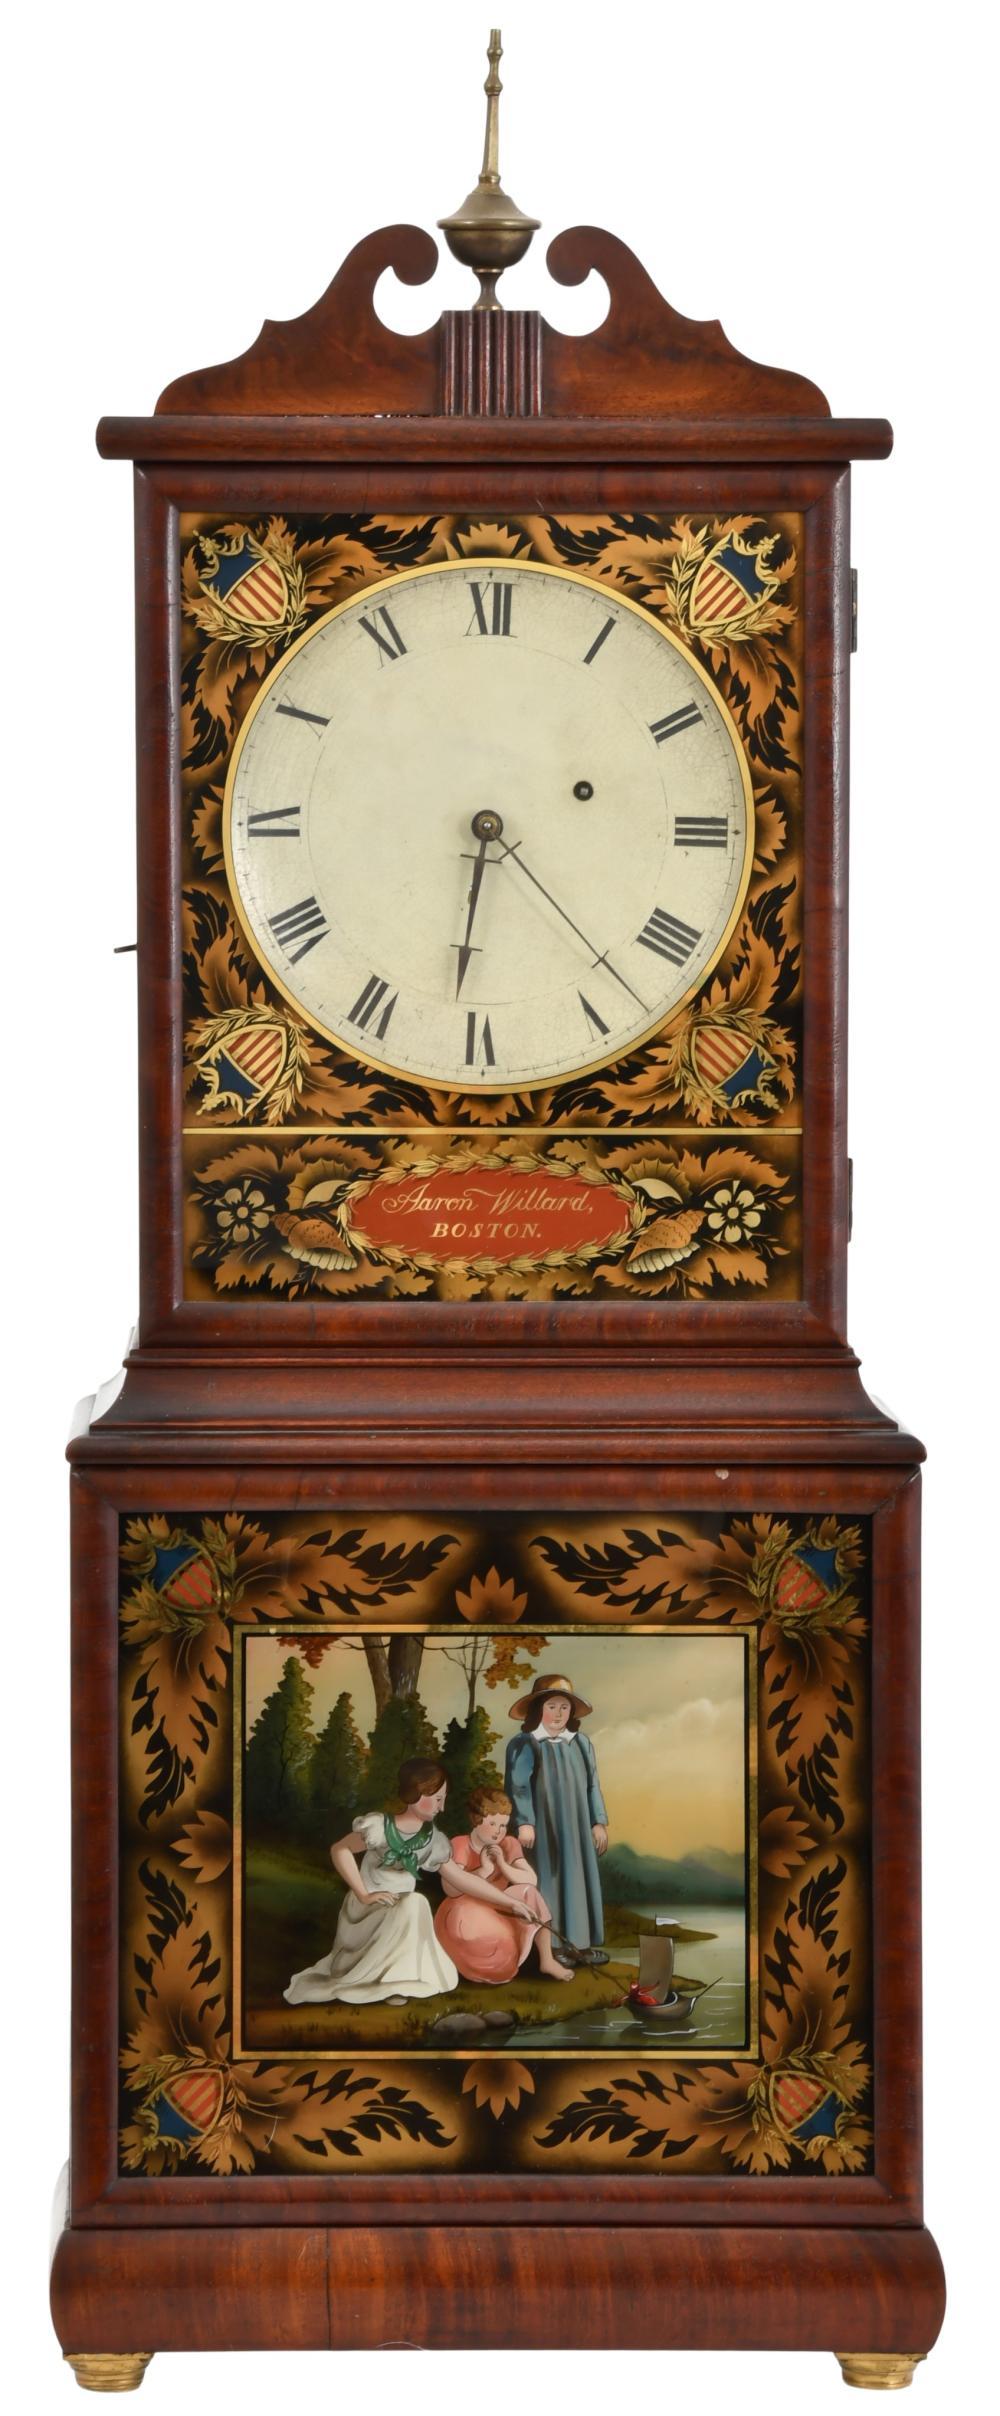 Aaron Willard (1757-1844), Boston, Massachusetts, Dish Dial Shelf Clock